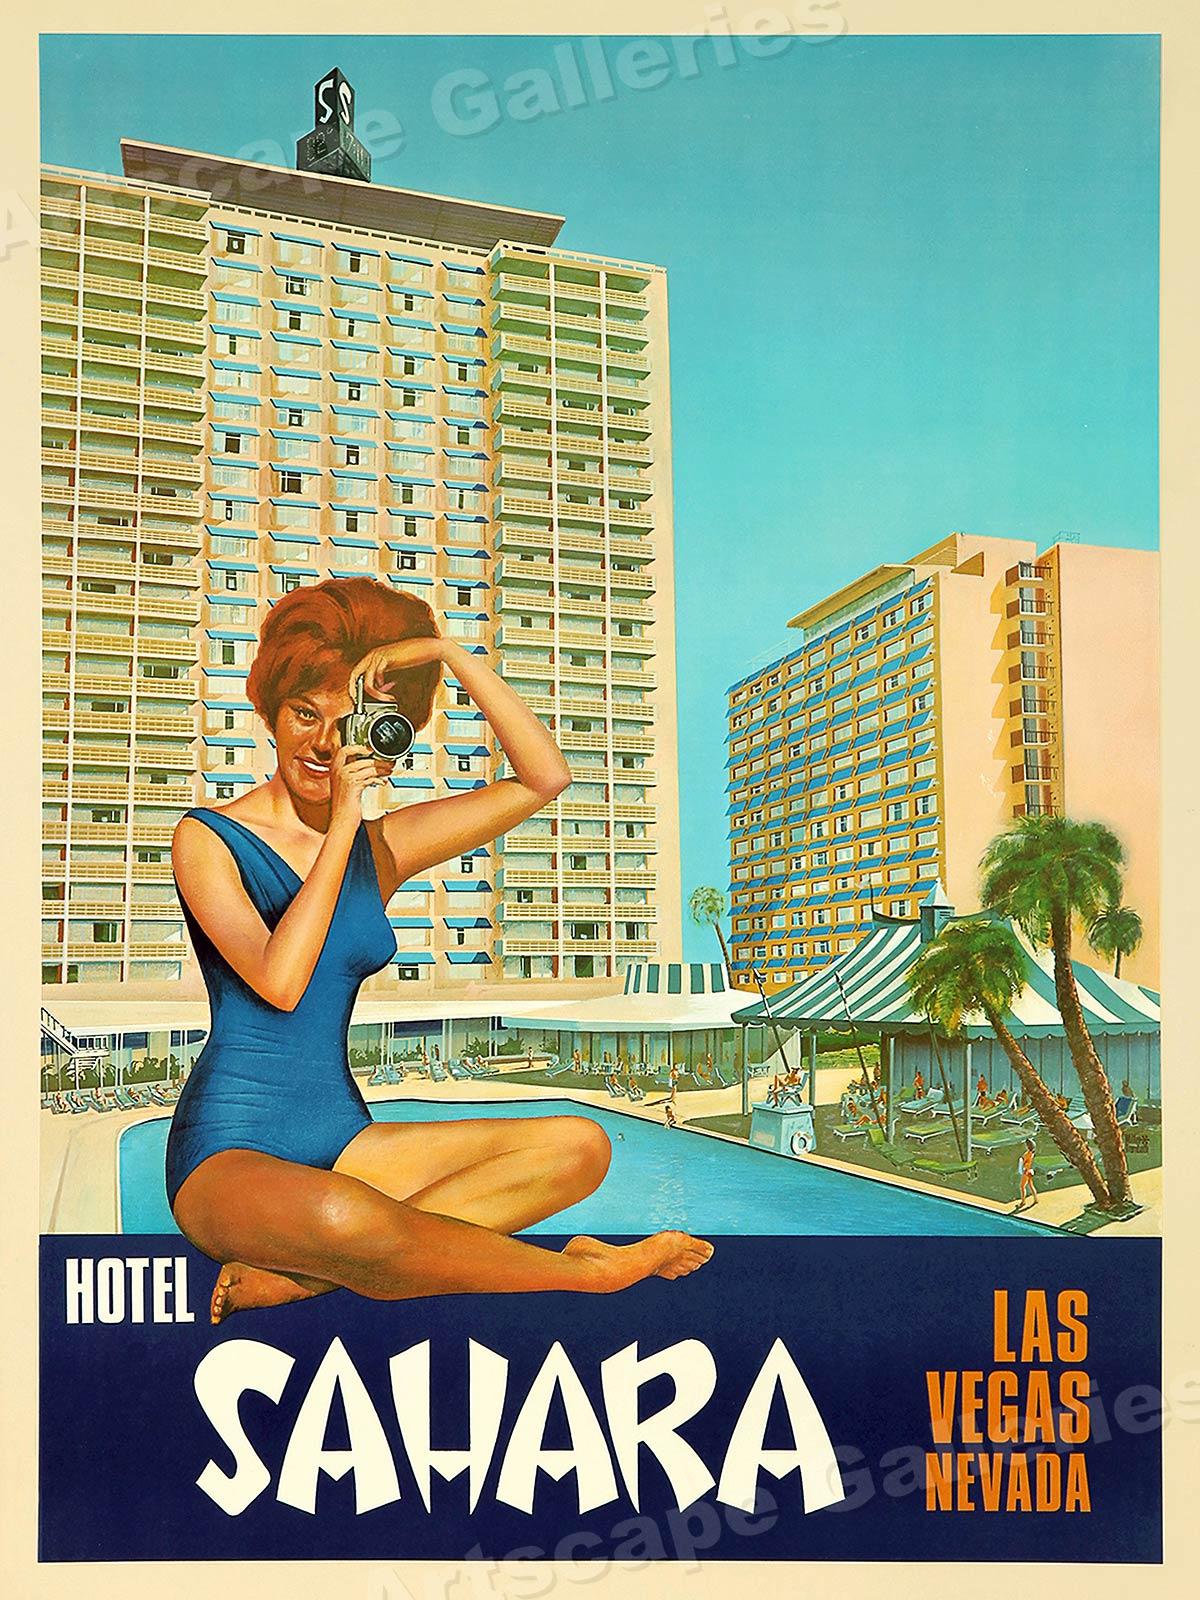 Las Vegas 1960s Sahara Hotel Vintage Style Vegas Travel Poster 20x28